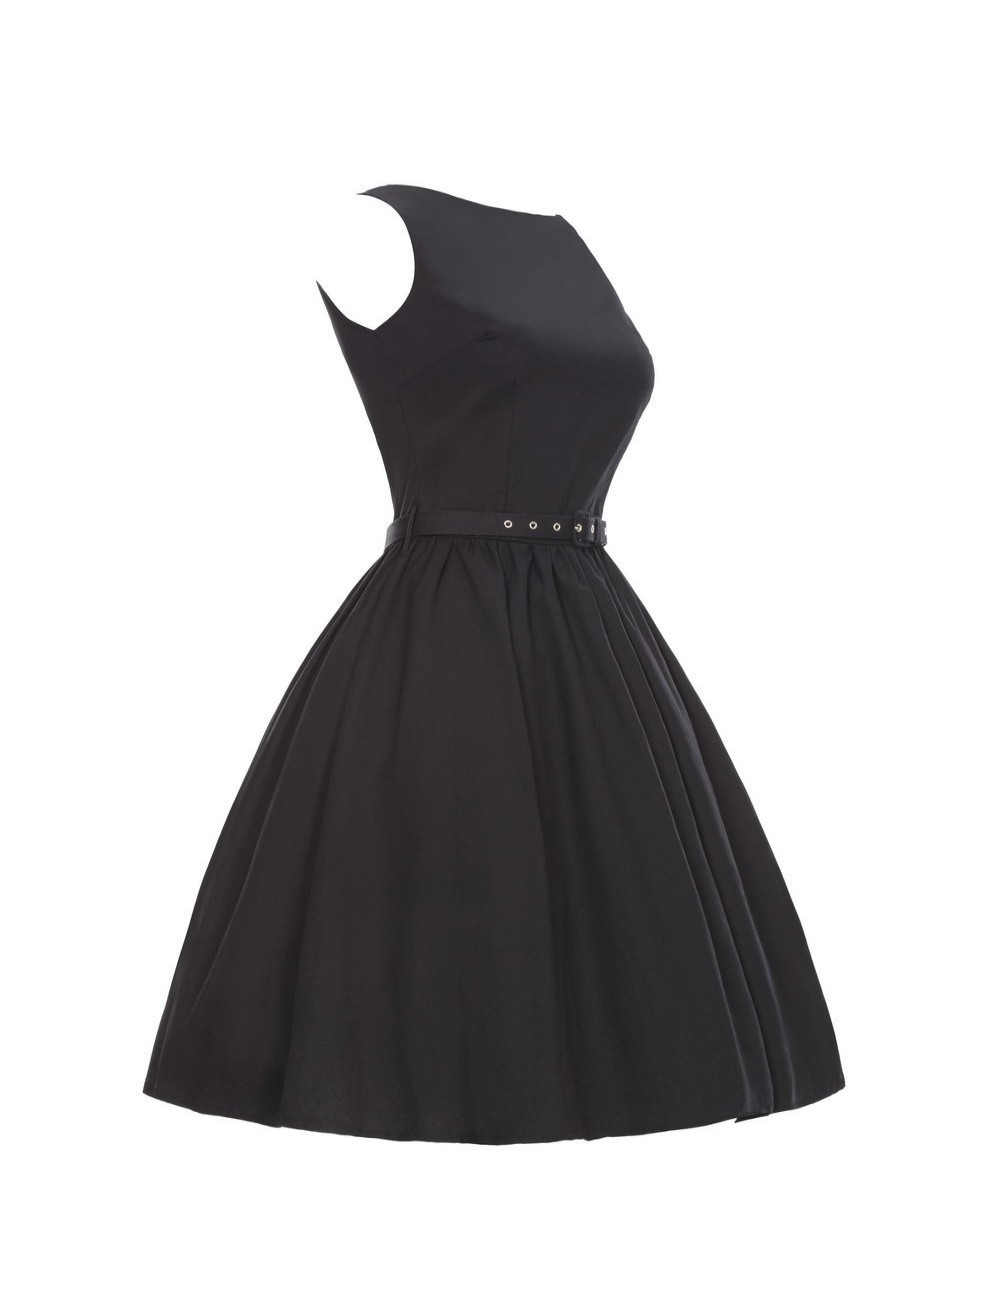 Online Get Cheap Classic Cocktail Dresses -Aliexpress.com ...